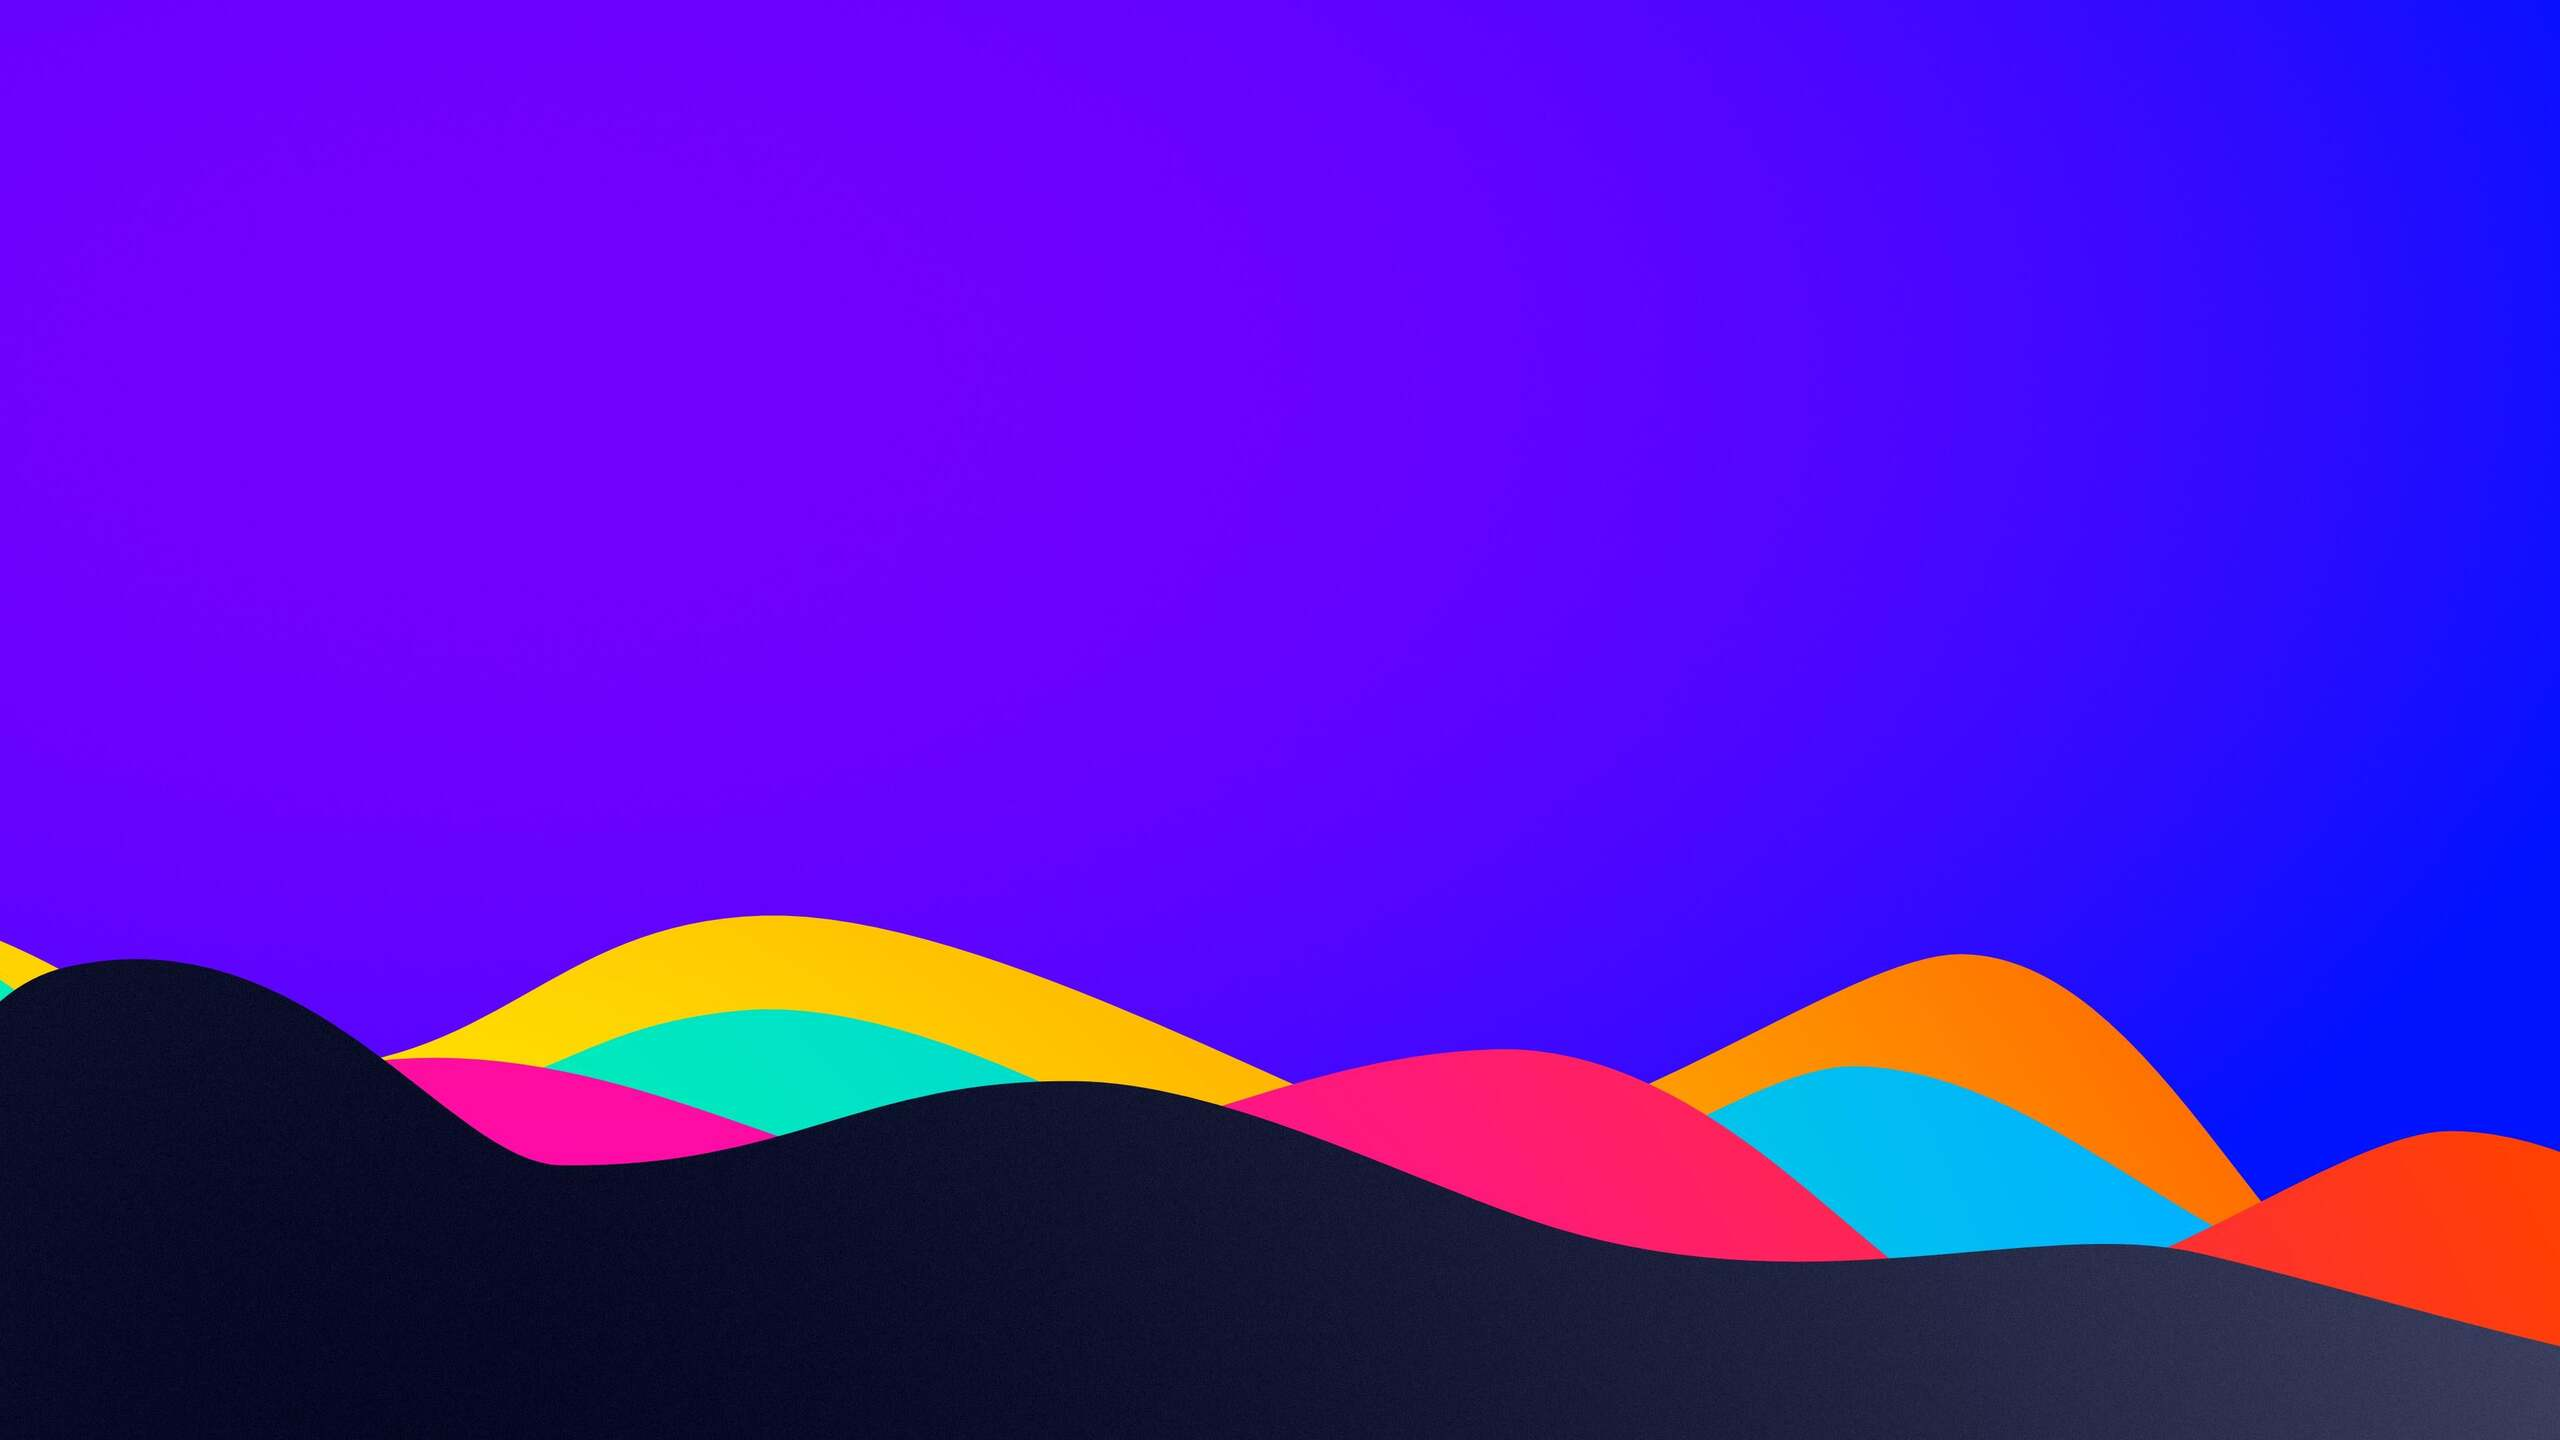 abstract-purple-waves-4k-as.jpg